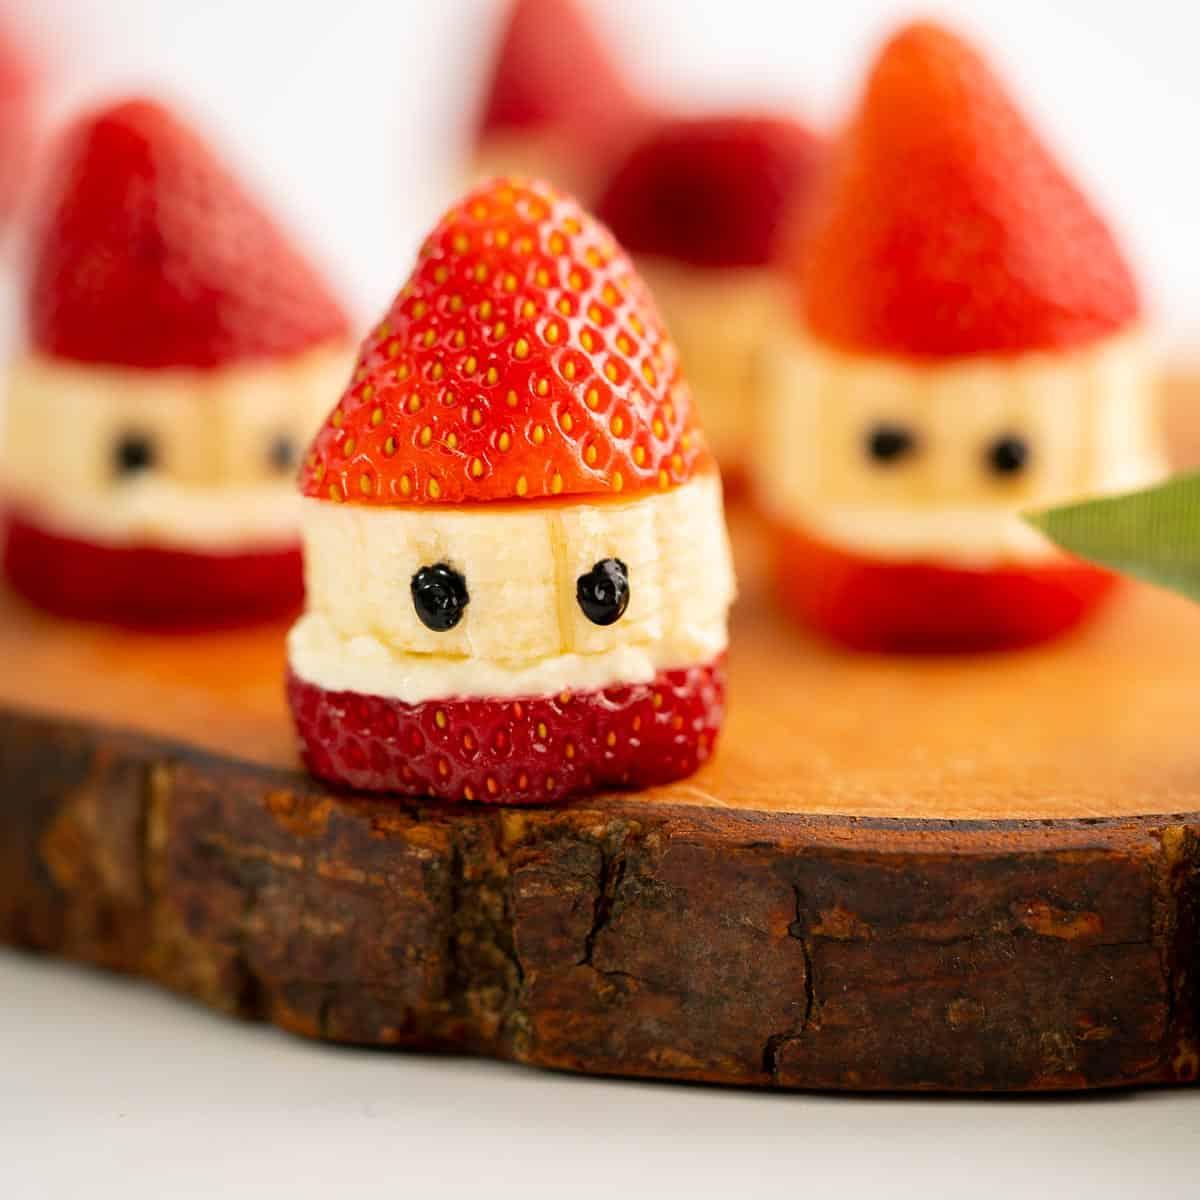 Strawberries, banana slices and cream cheese made to look like Santas.